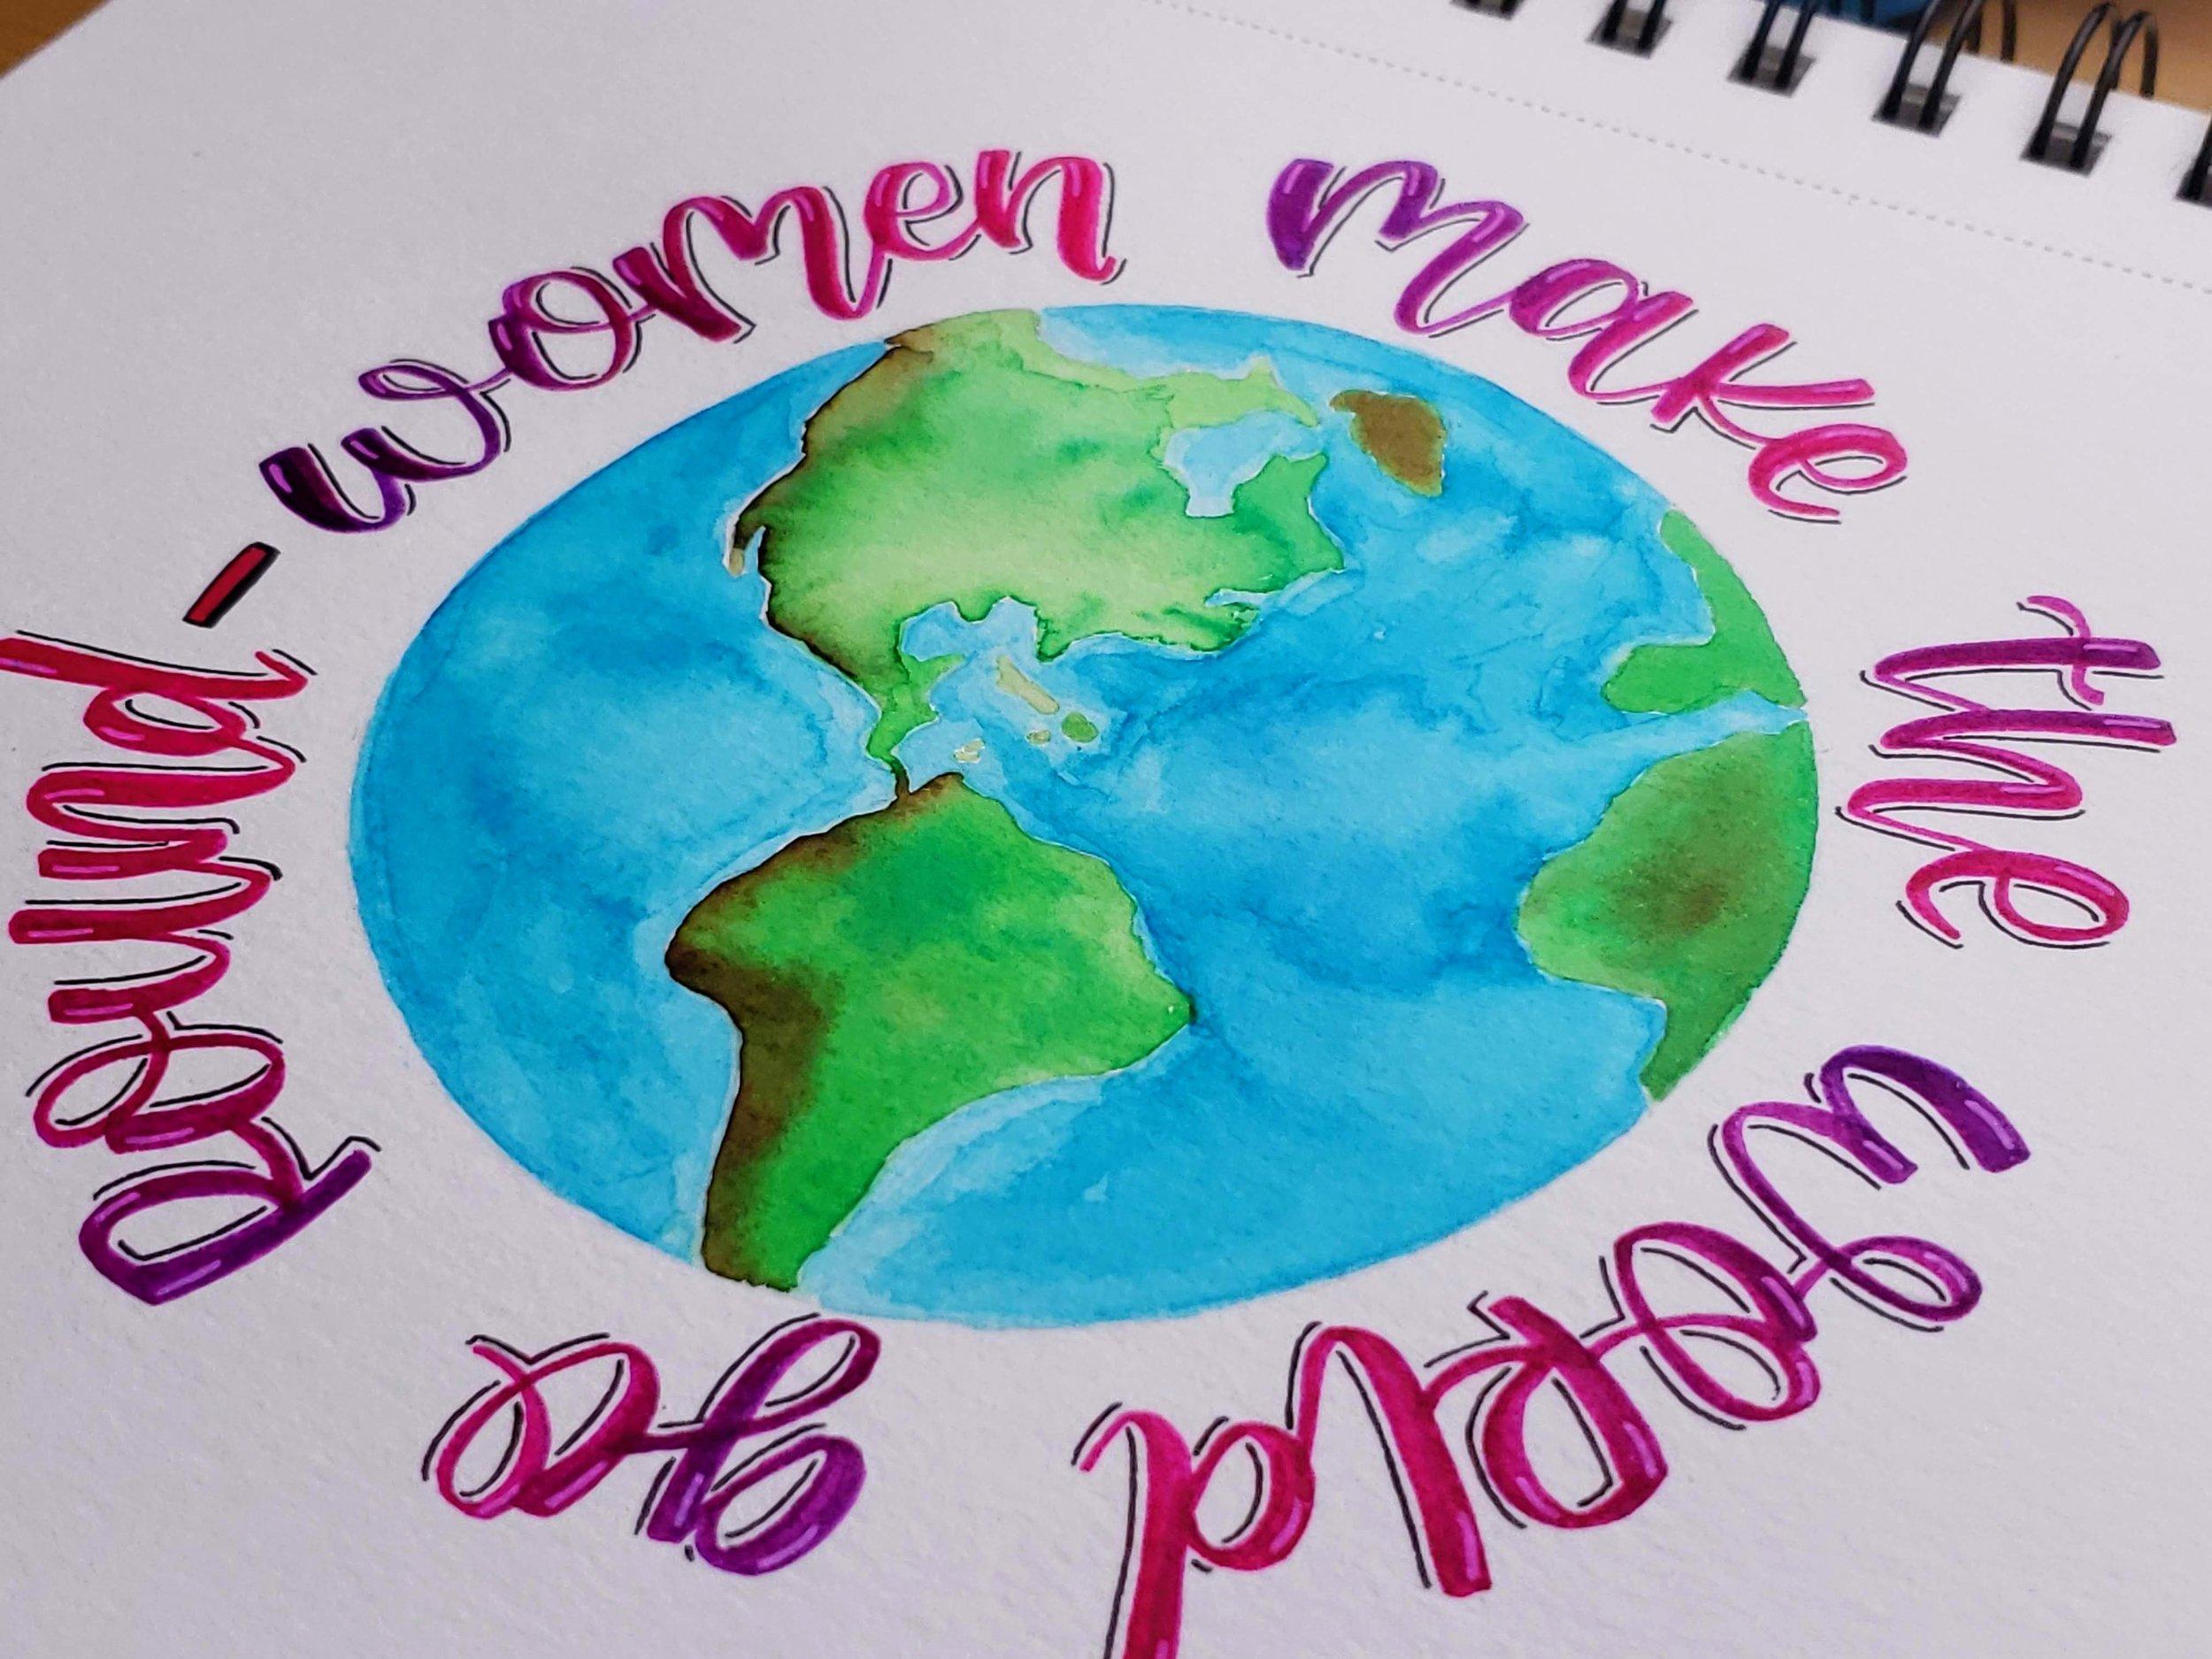 women-make-the-world-go-round-Letters-by-gigi-hand-lettering-los-angeles-artist-custom-typography-modern-calligraphy-instagram-art